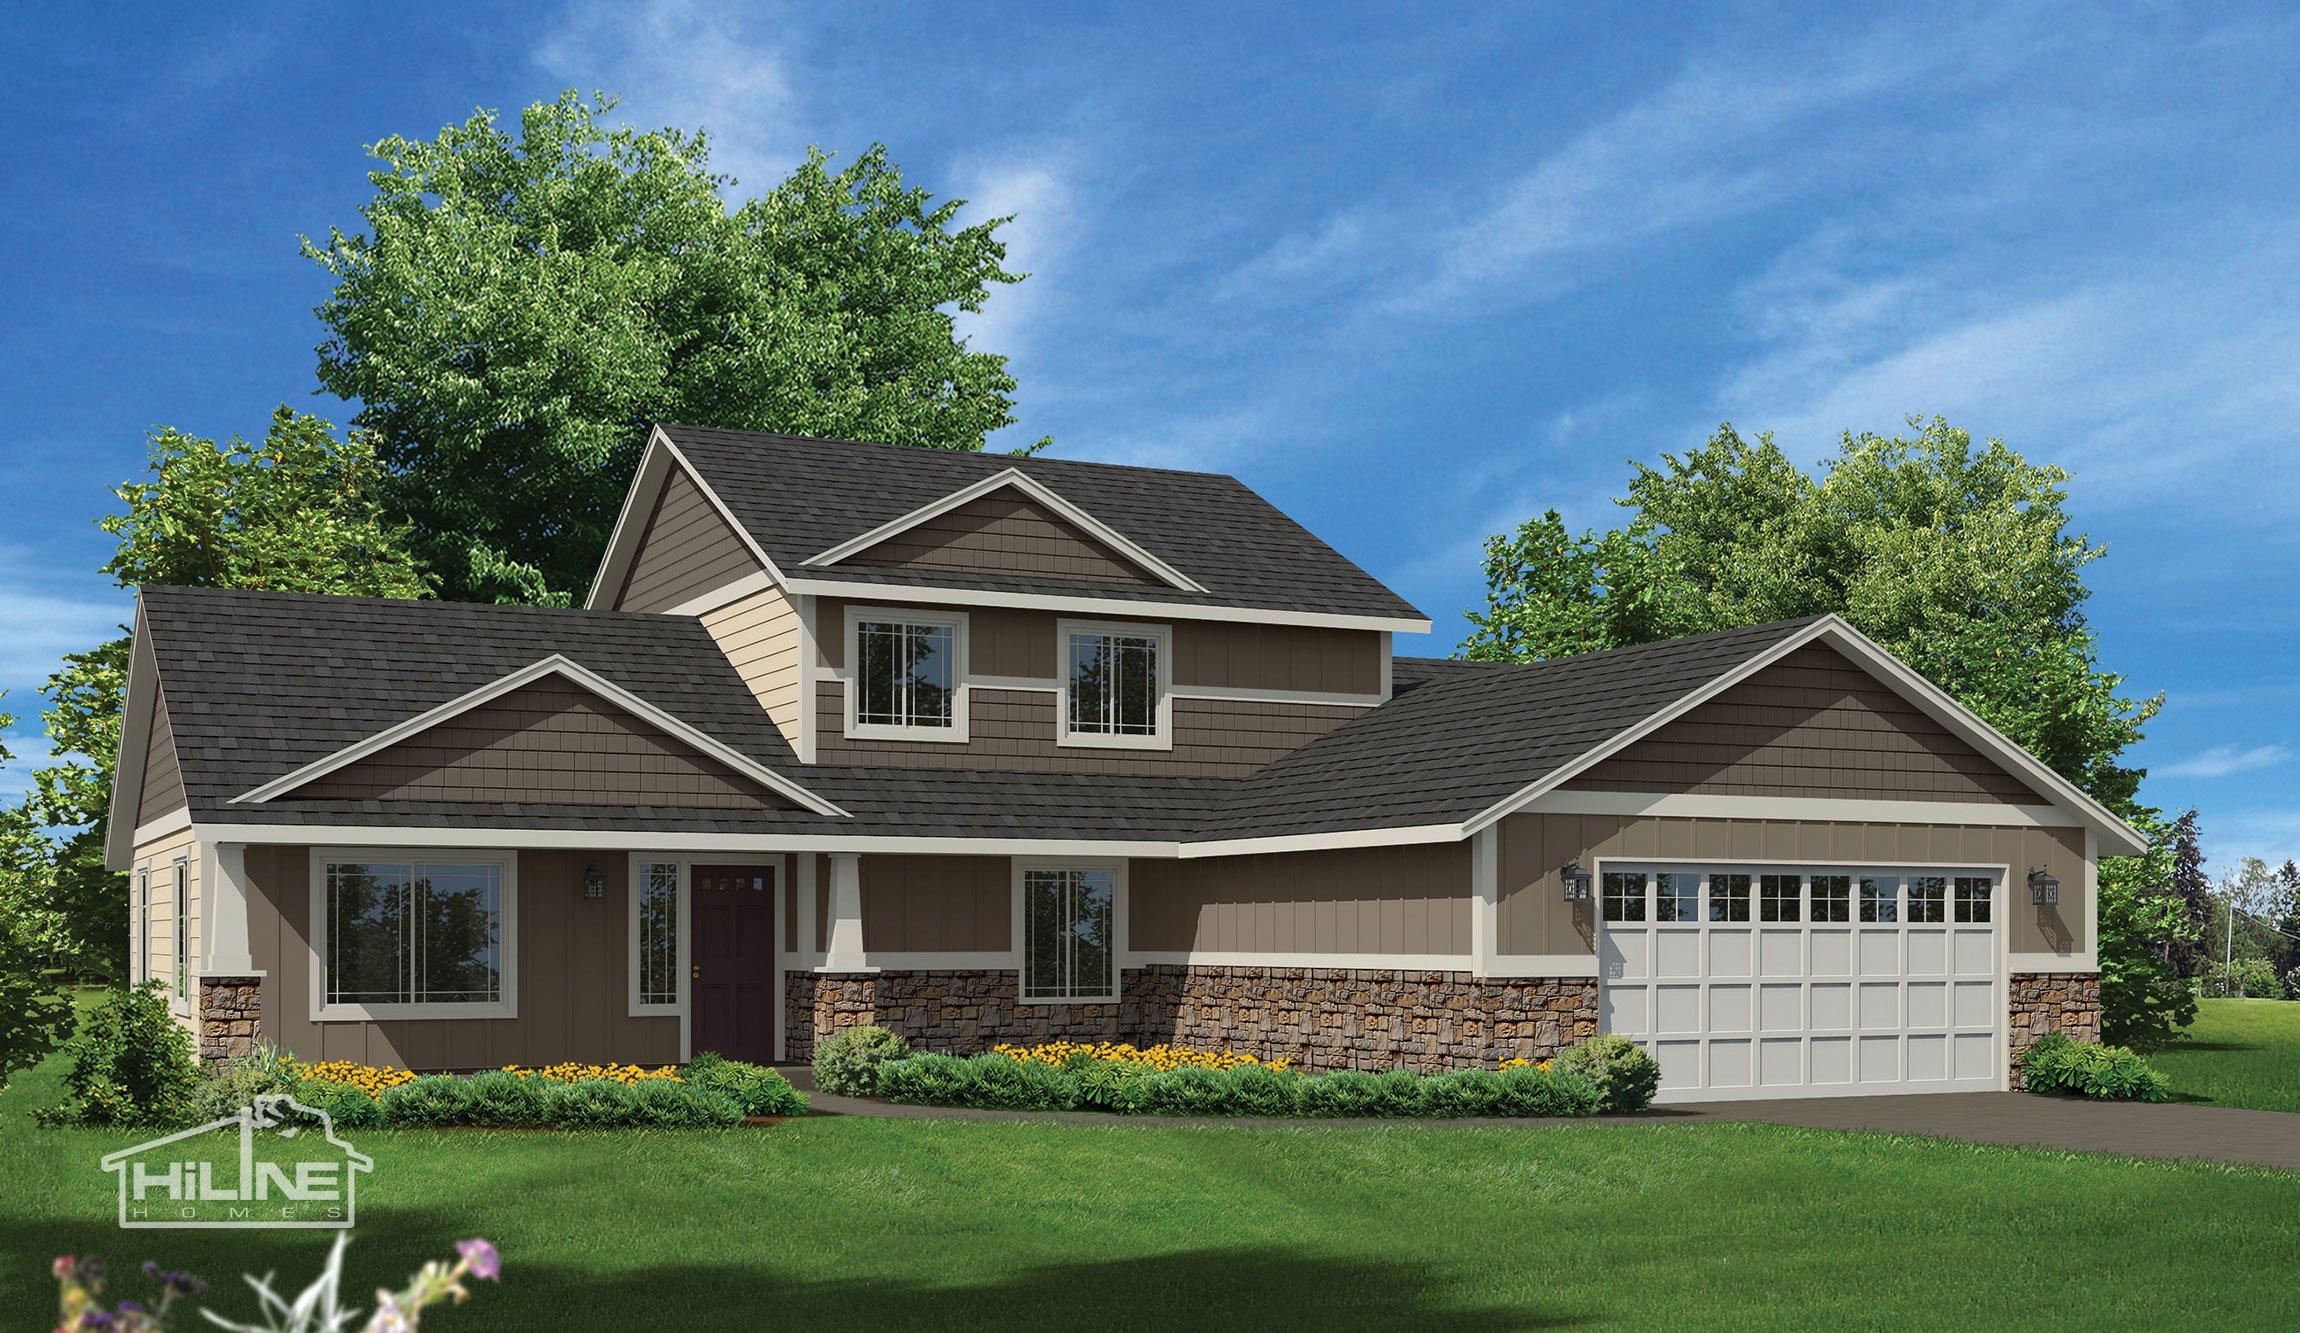 Home Plan 2345